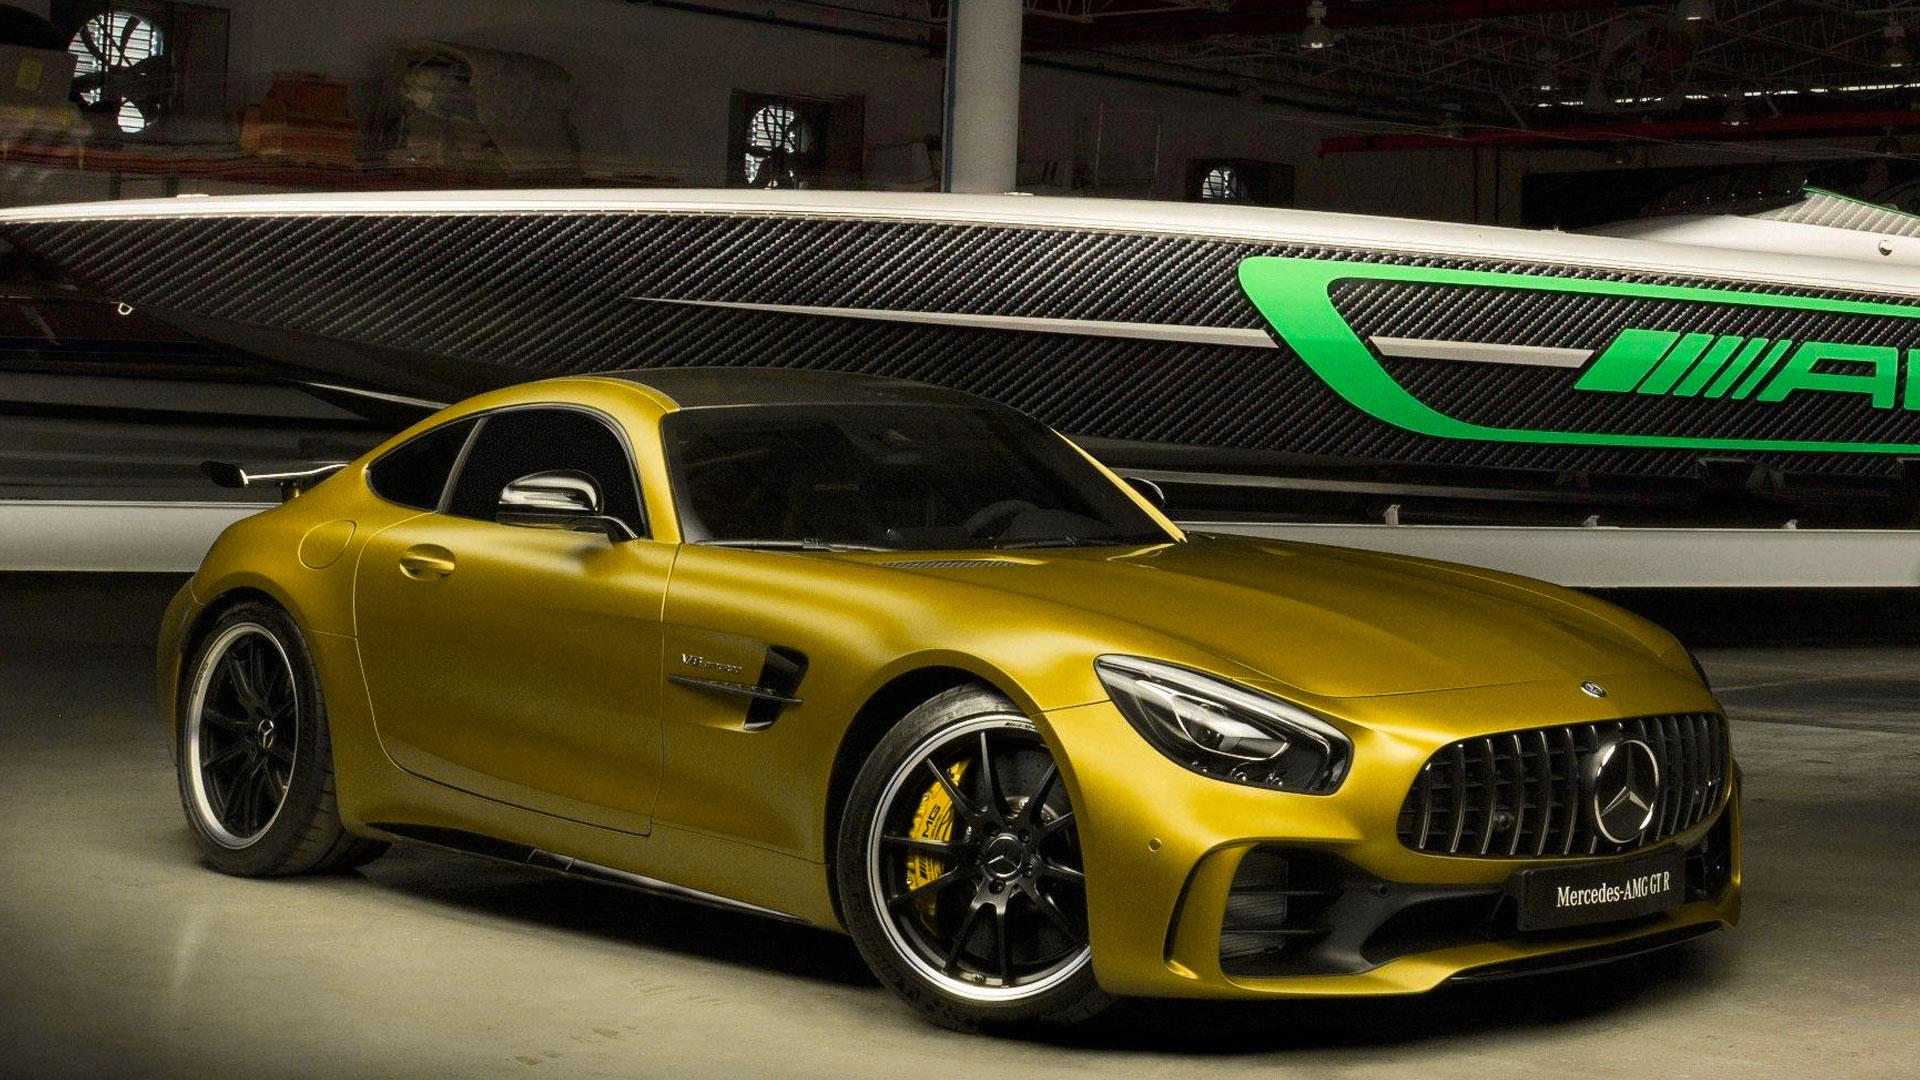 Rent Mercedes Benz Amg Gtr Https Luxuryrentalscars Com